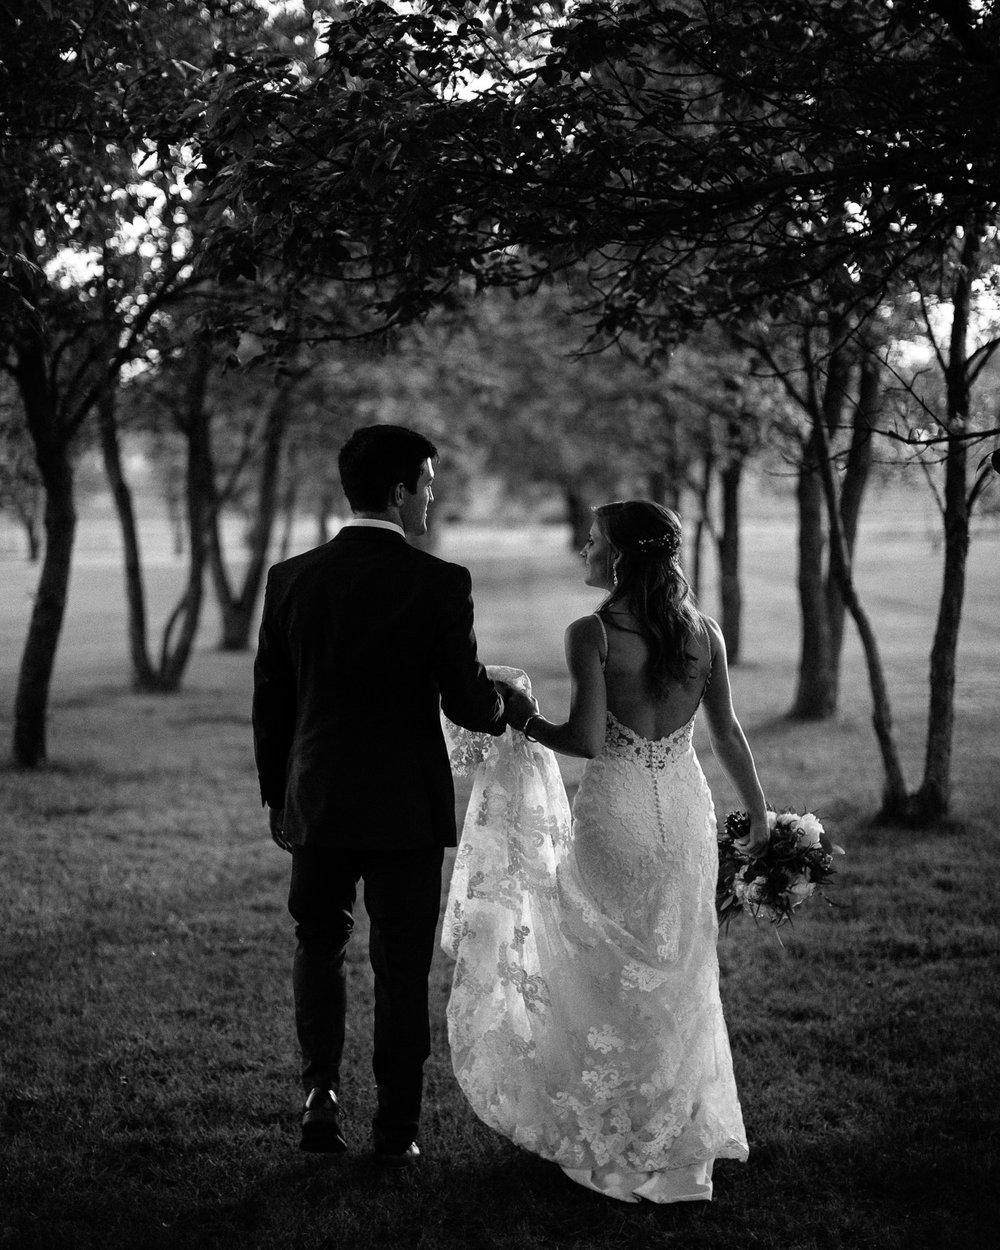 wedding-elopement-adventerous-romantic-timeless-south-dakota-blue-haven-barn-076.jpg